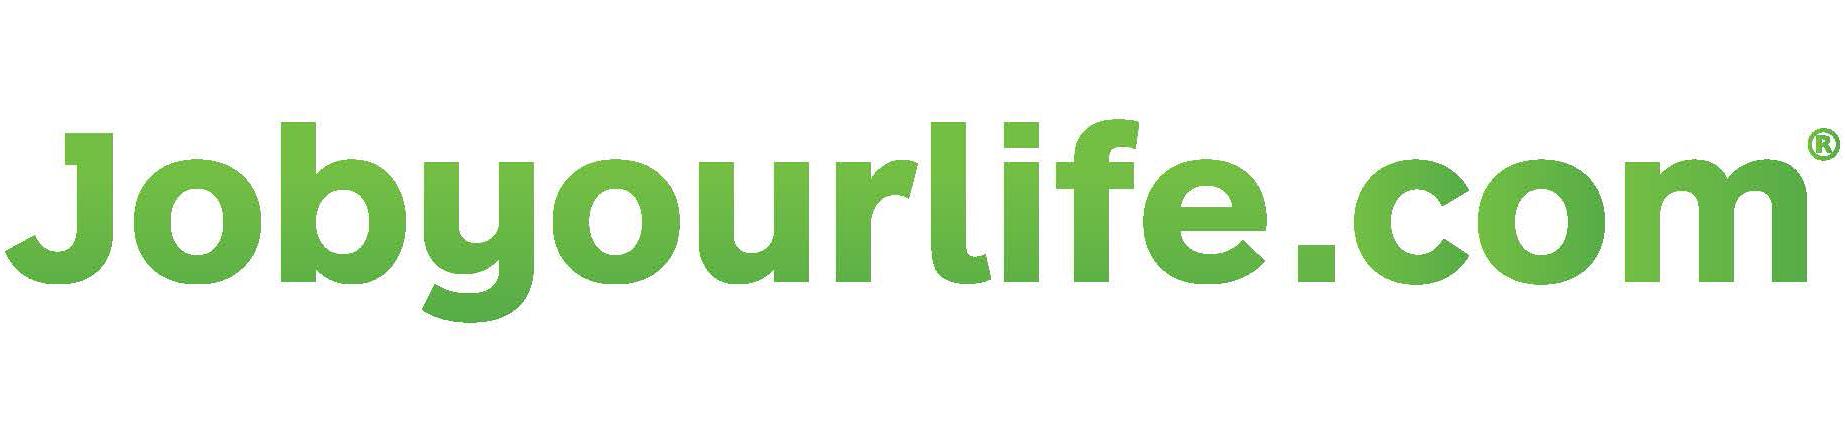 Jobyourlife logo